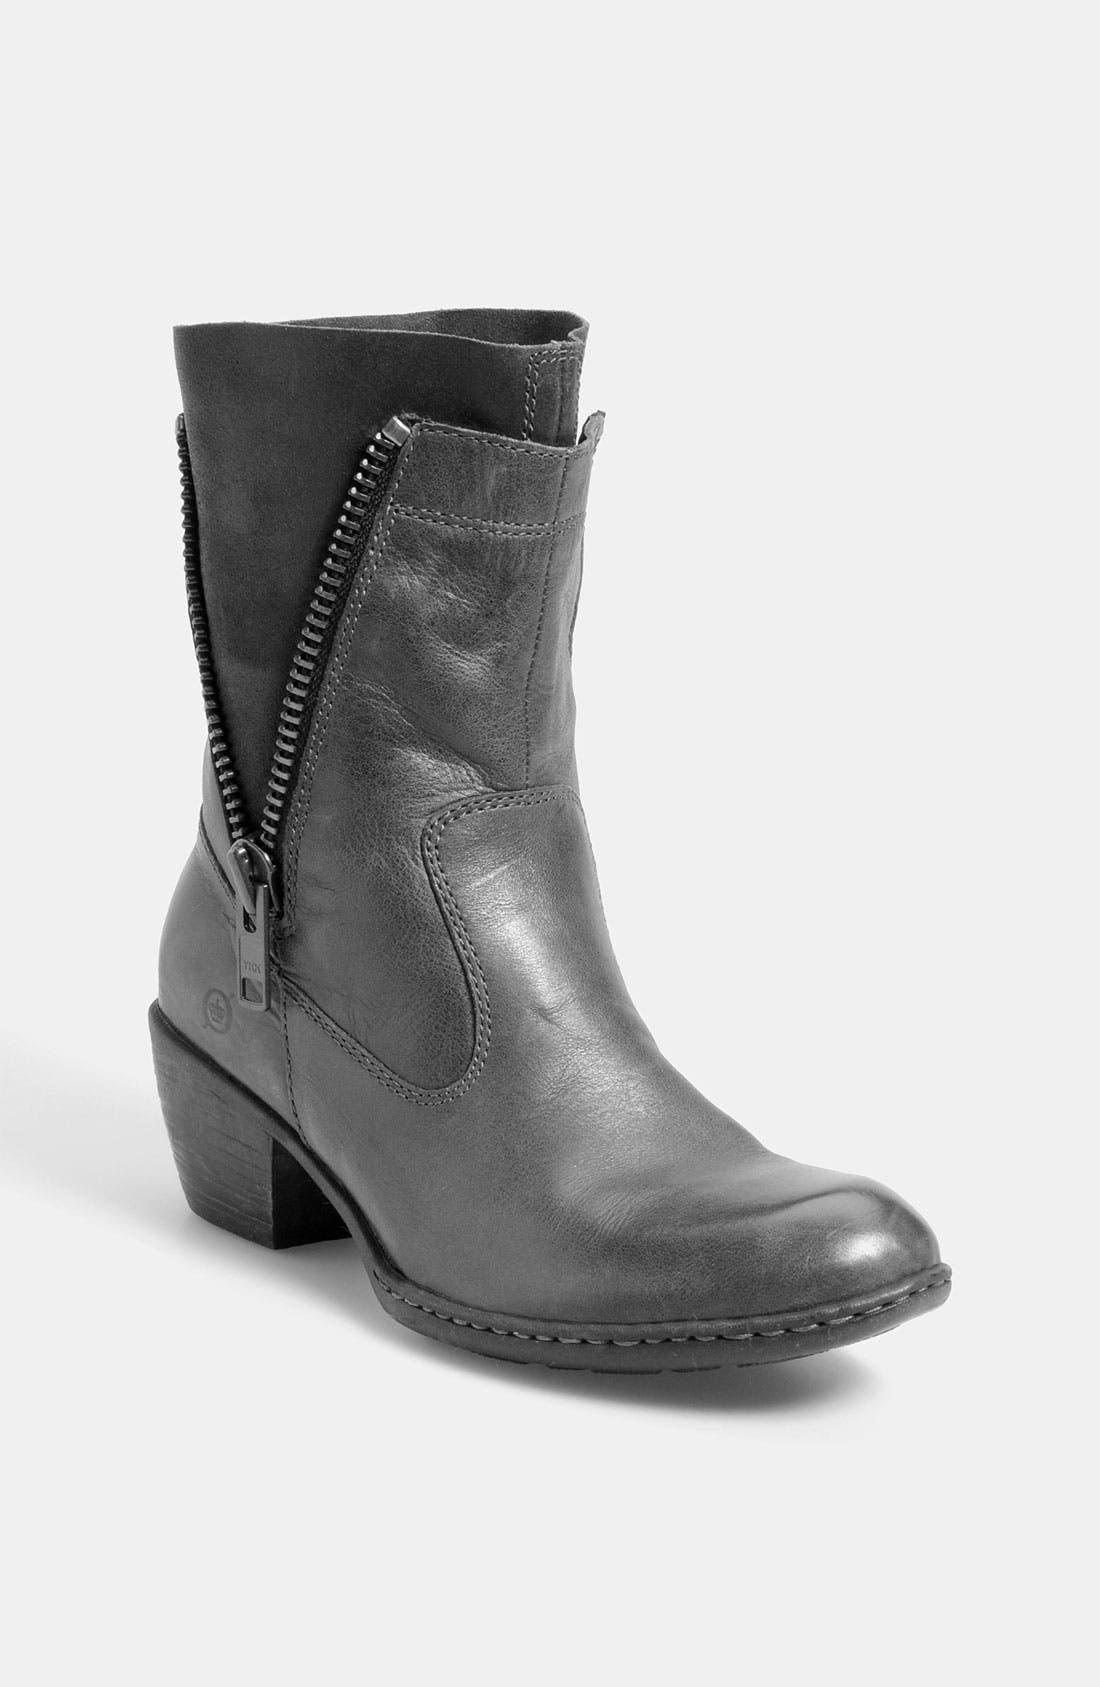 Alternate Image 1 Selected - Børn 'Mila' Boot